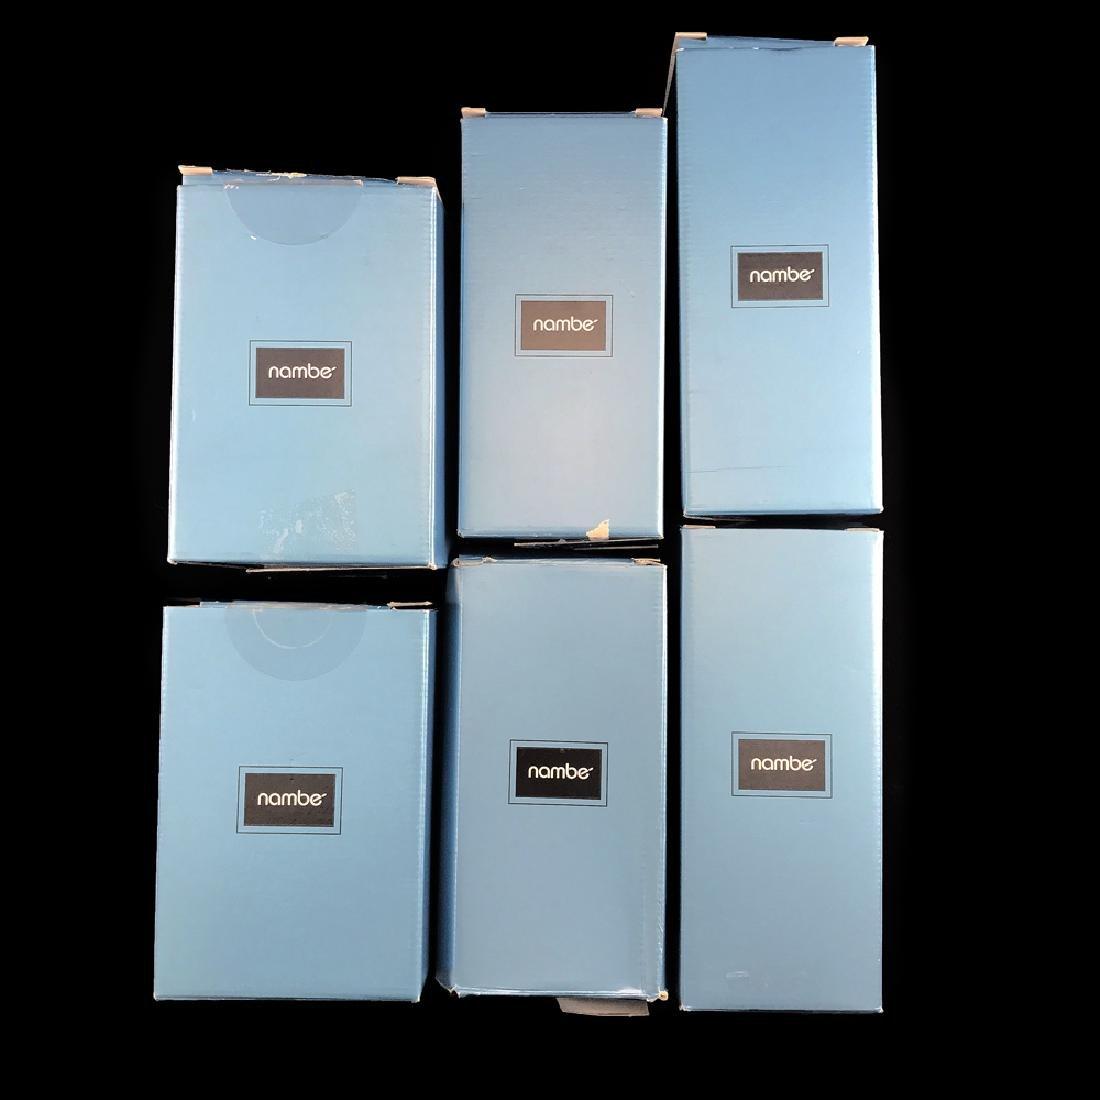 6 Zeisel Nambe Crystal Goblets, 3 sizes (2008) - 8